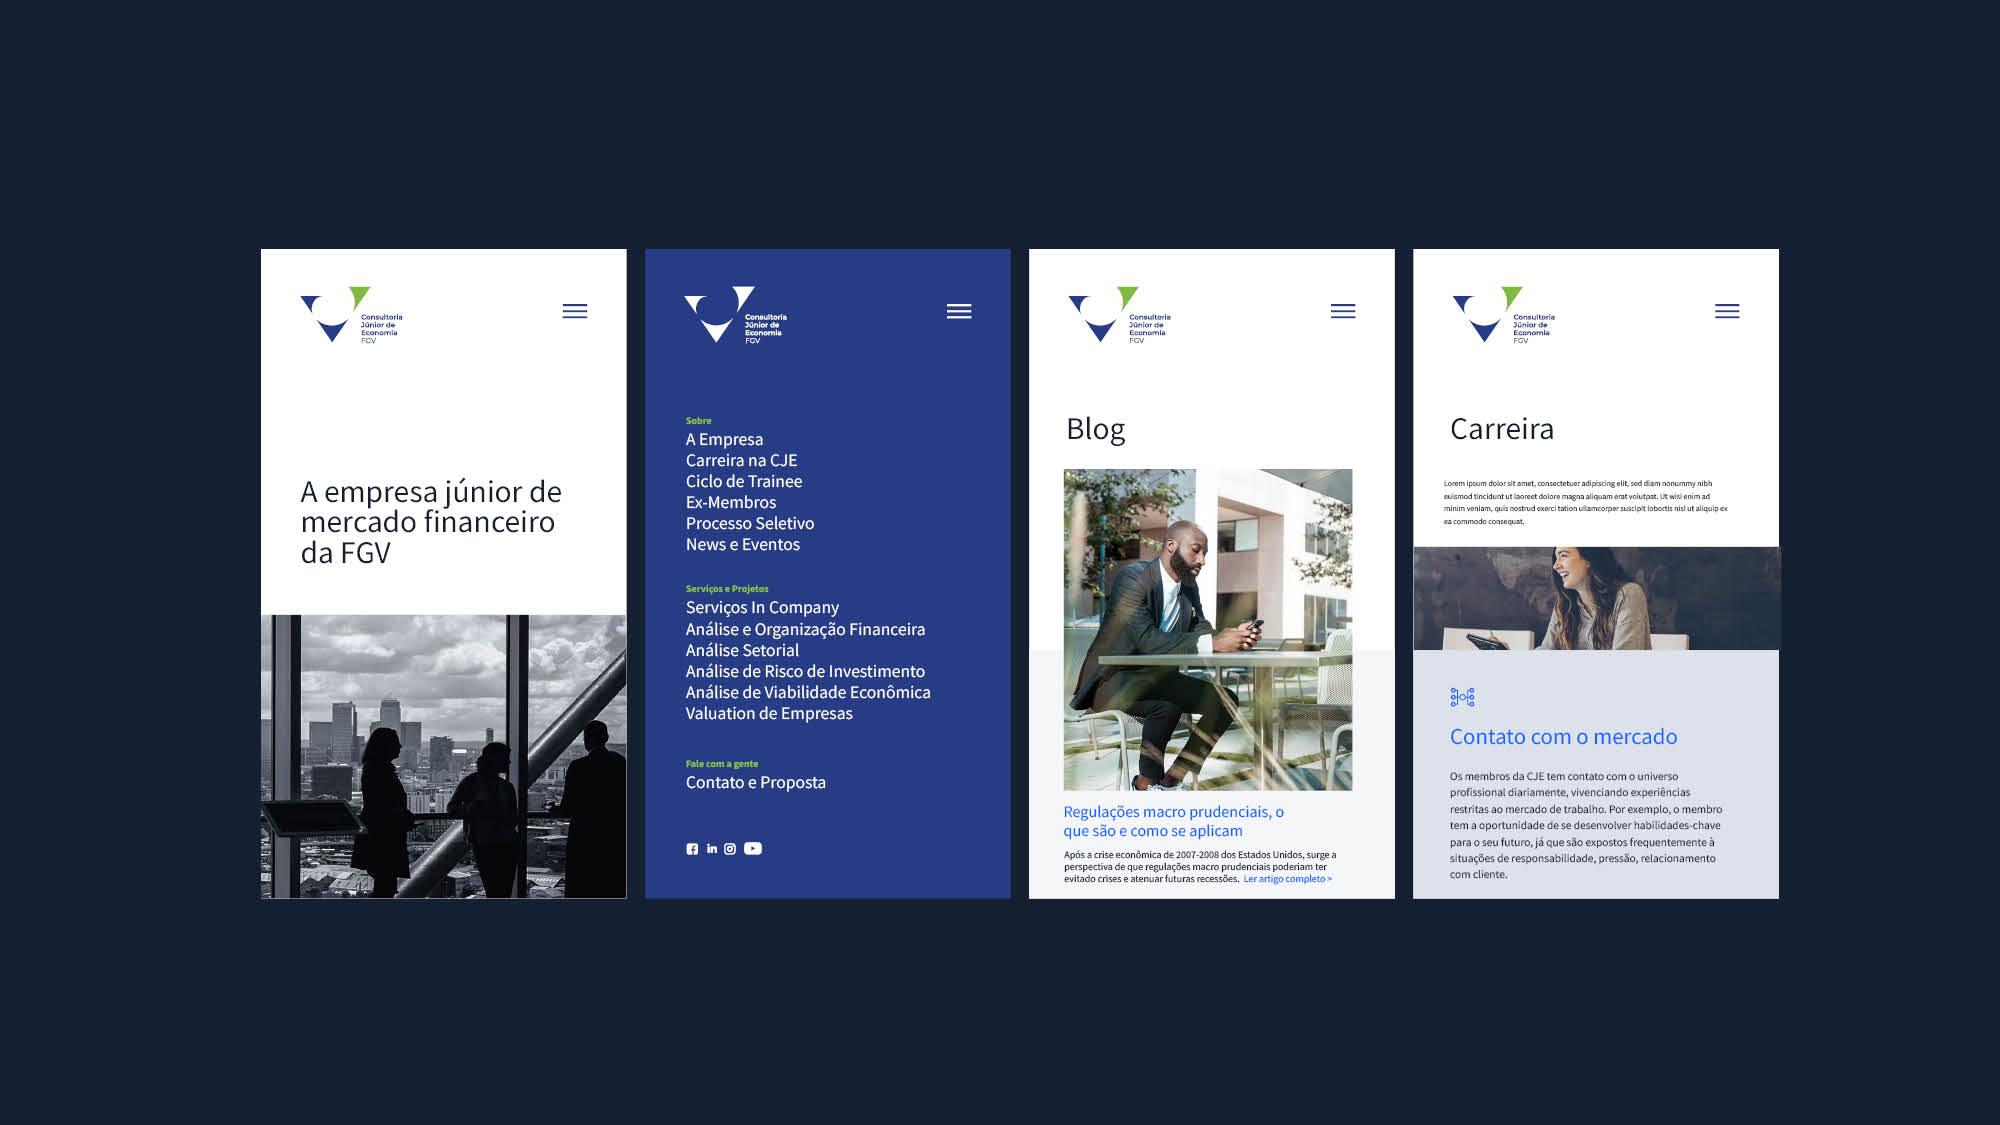 Lanatta-Branding-and-Design-Site-CJE-FGV6